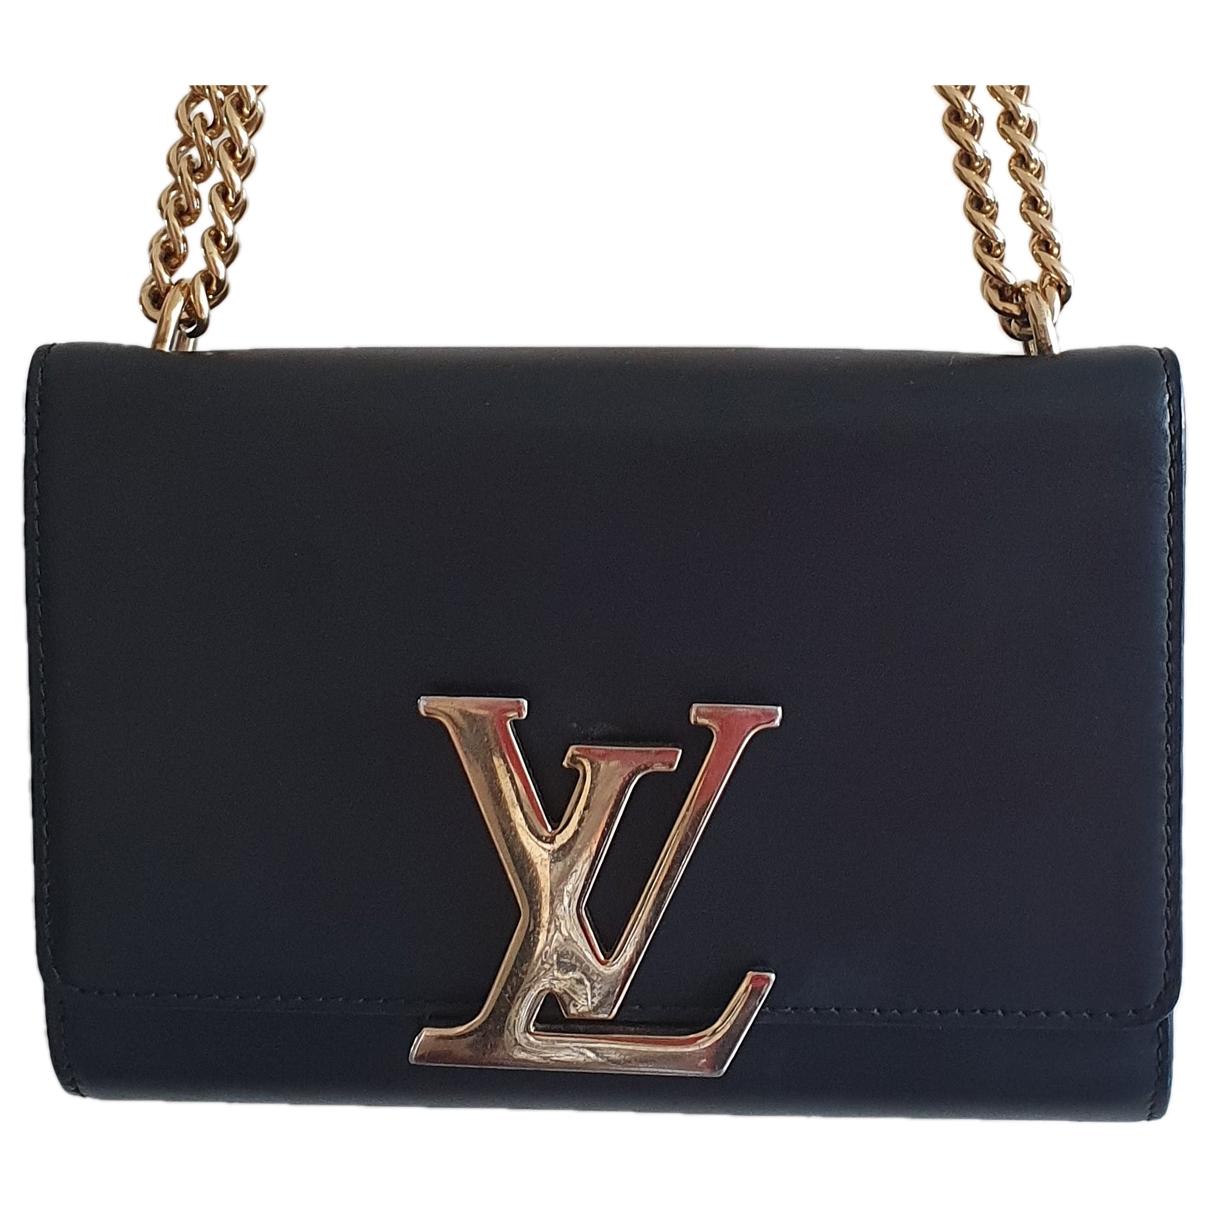 Bandolera Louise de Cuero Louis Vuitton